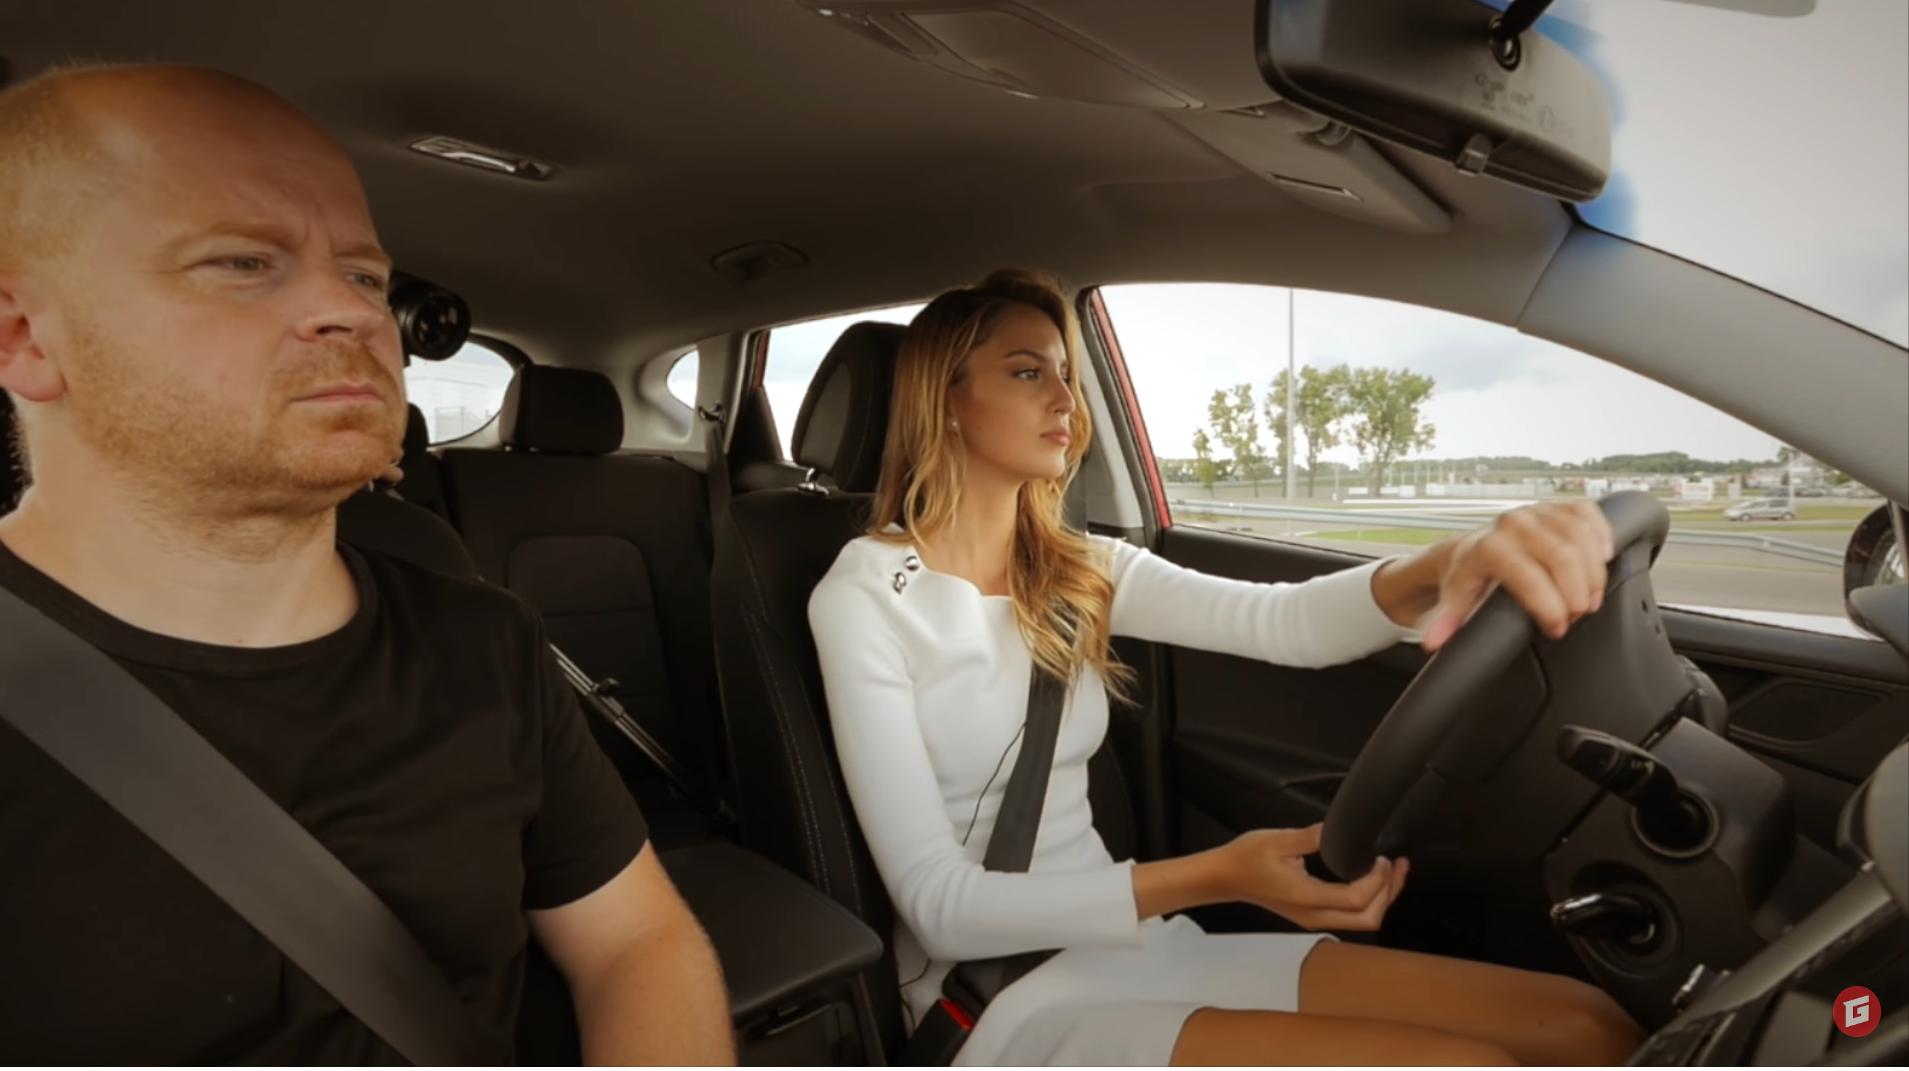 Videoautoškola s Miss 2016: Točenie volantom III.